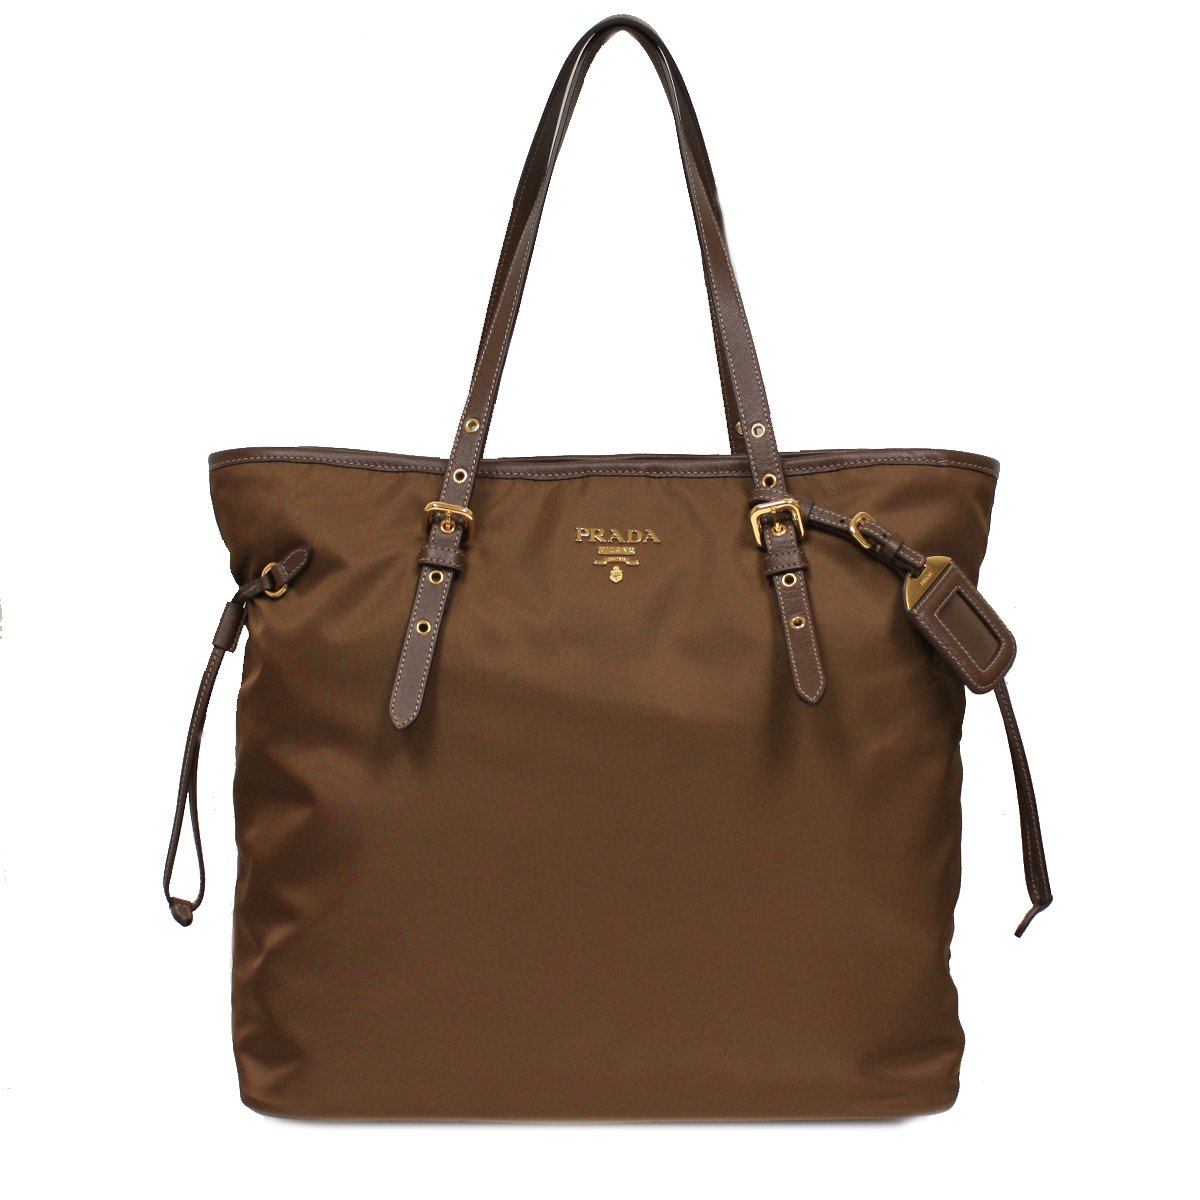 84726fad4d39 Amazon.com   PRADA BR4997 Tessuto Saffian Shopping Tote Bag Large Corinto  Brown Shoulder Handbag Purse   Everything Else